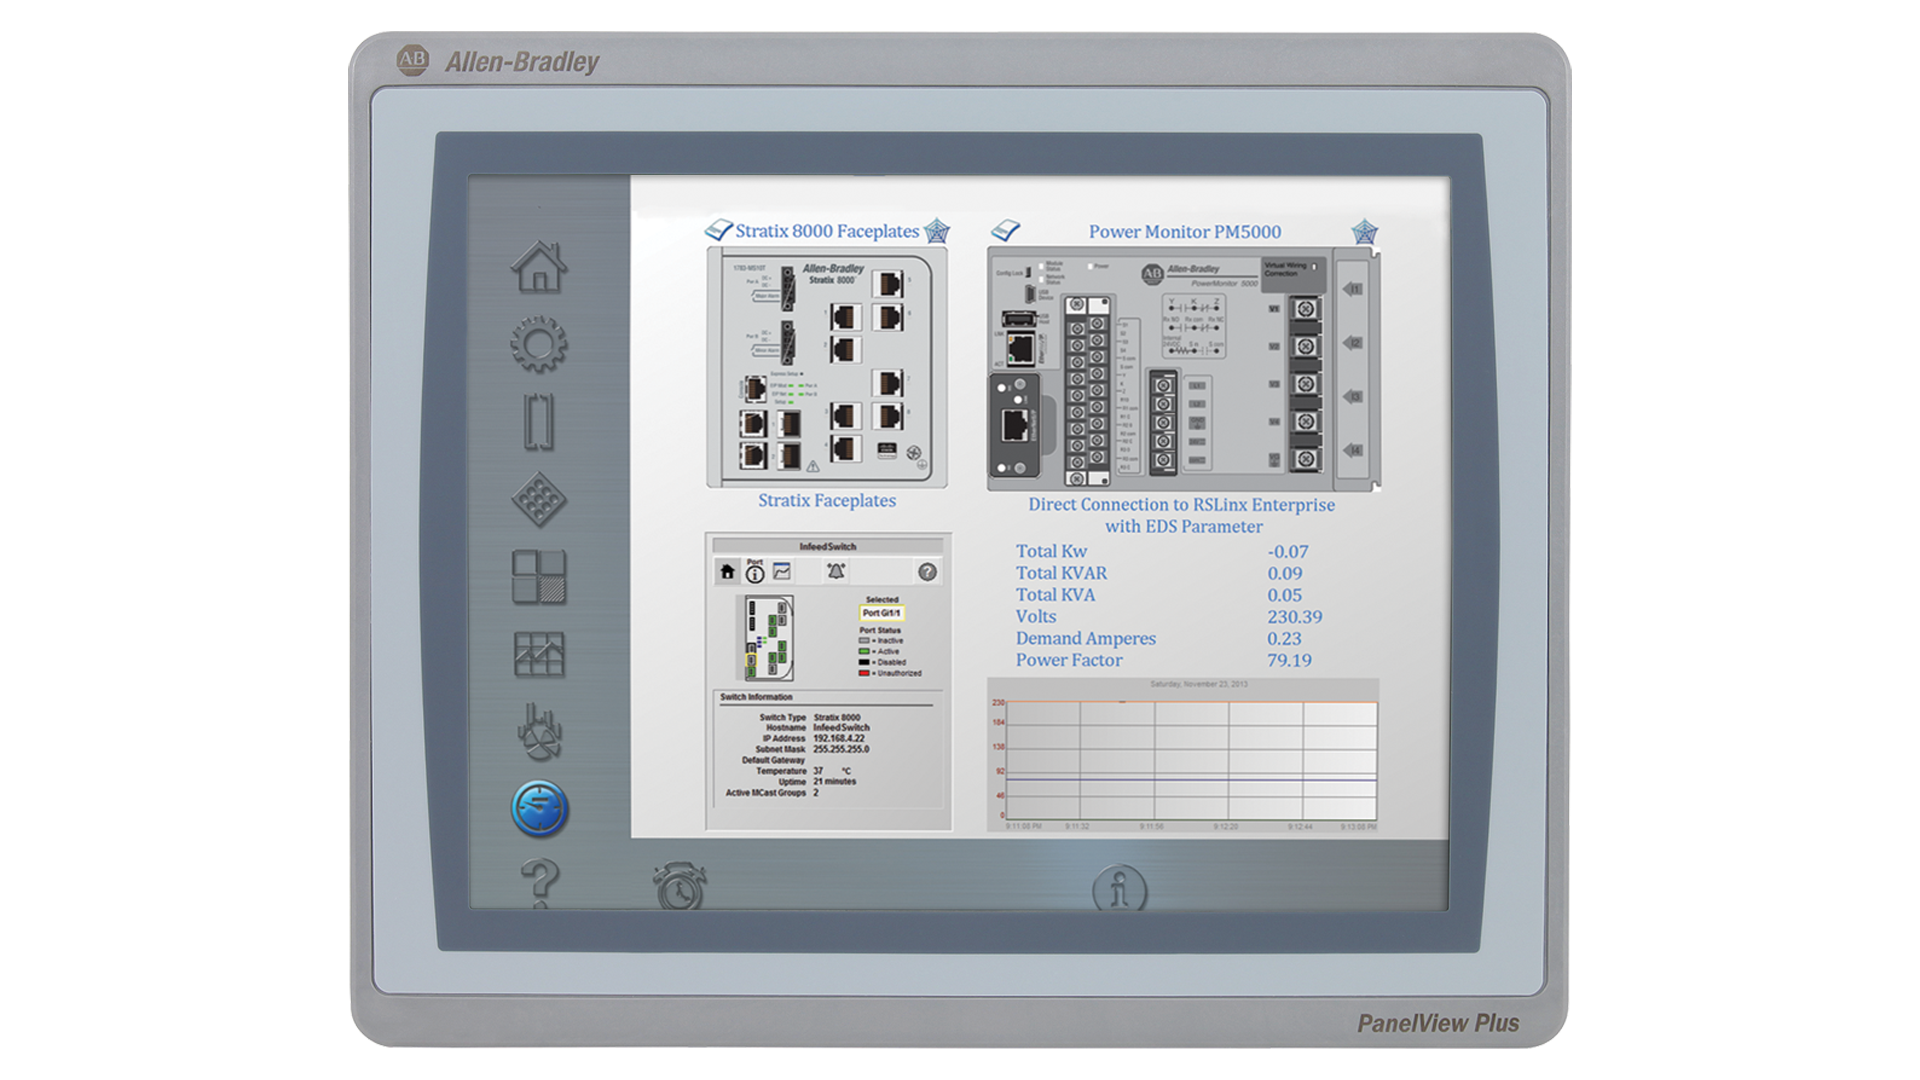 PanelViewPlus7-15in monitor